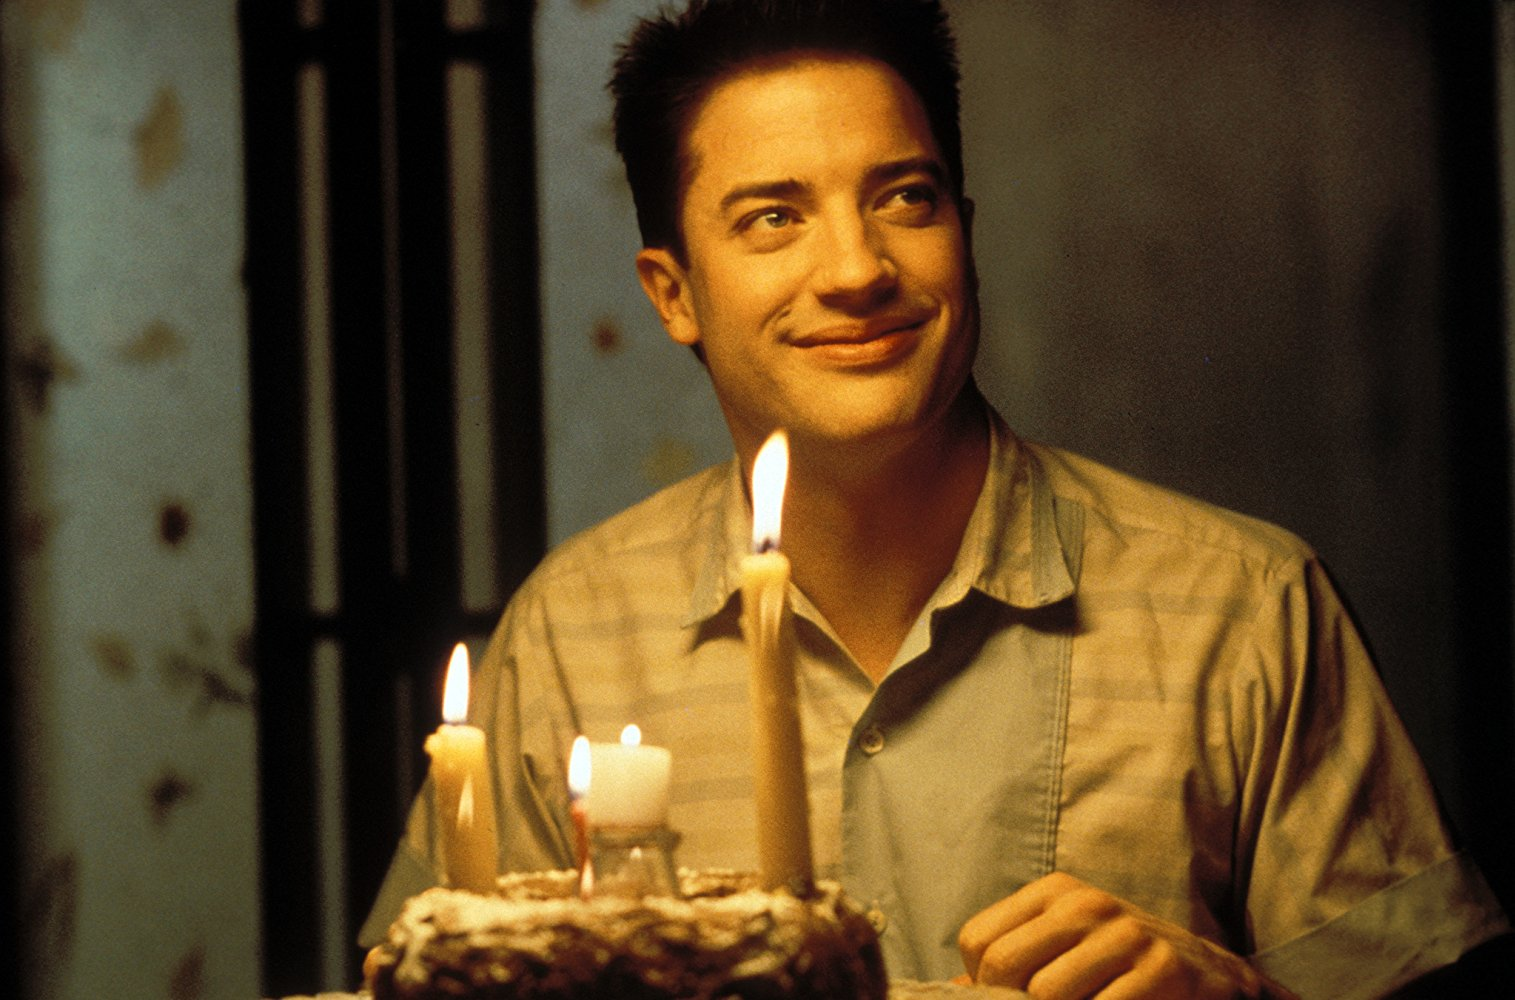 Brendan fraser birthday